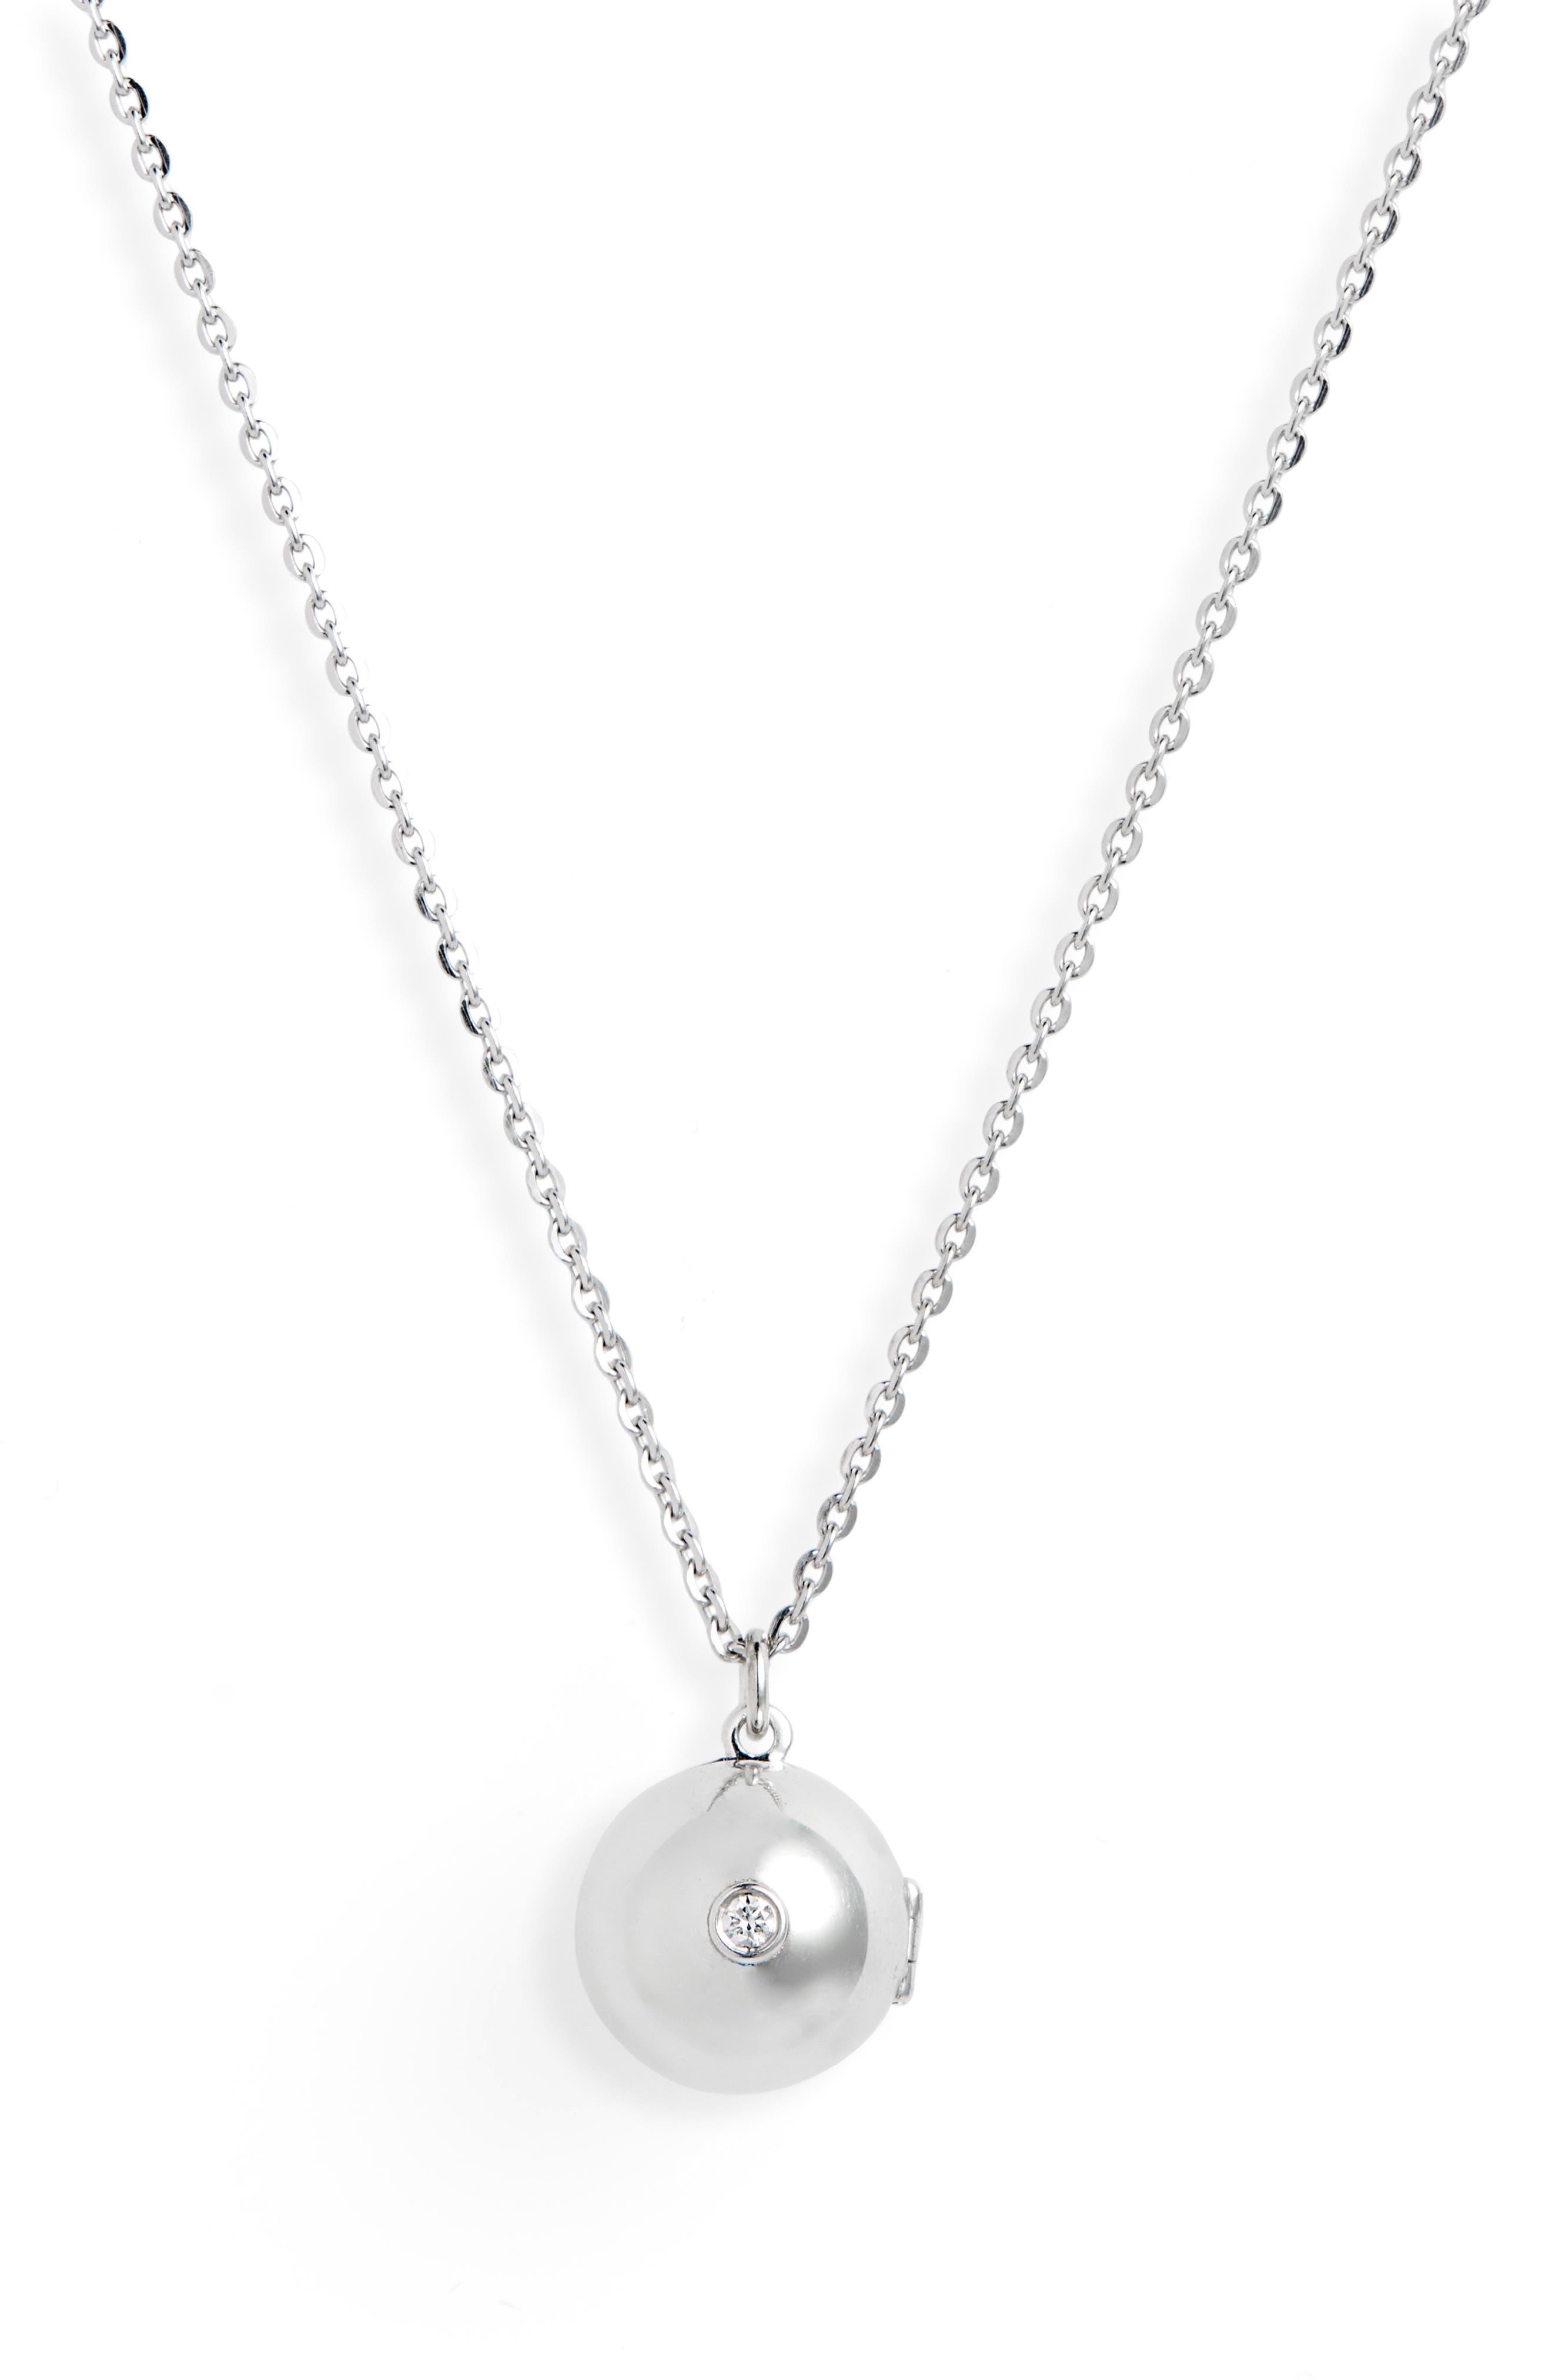 KATKIM Boob Diamond Locket Necklace in Silver